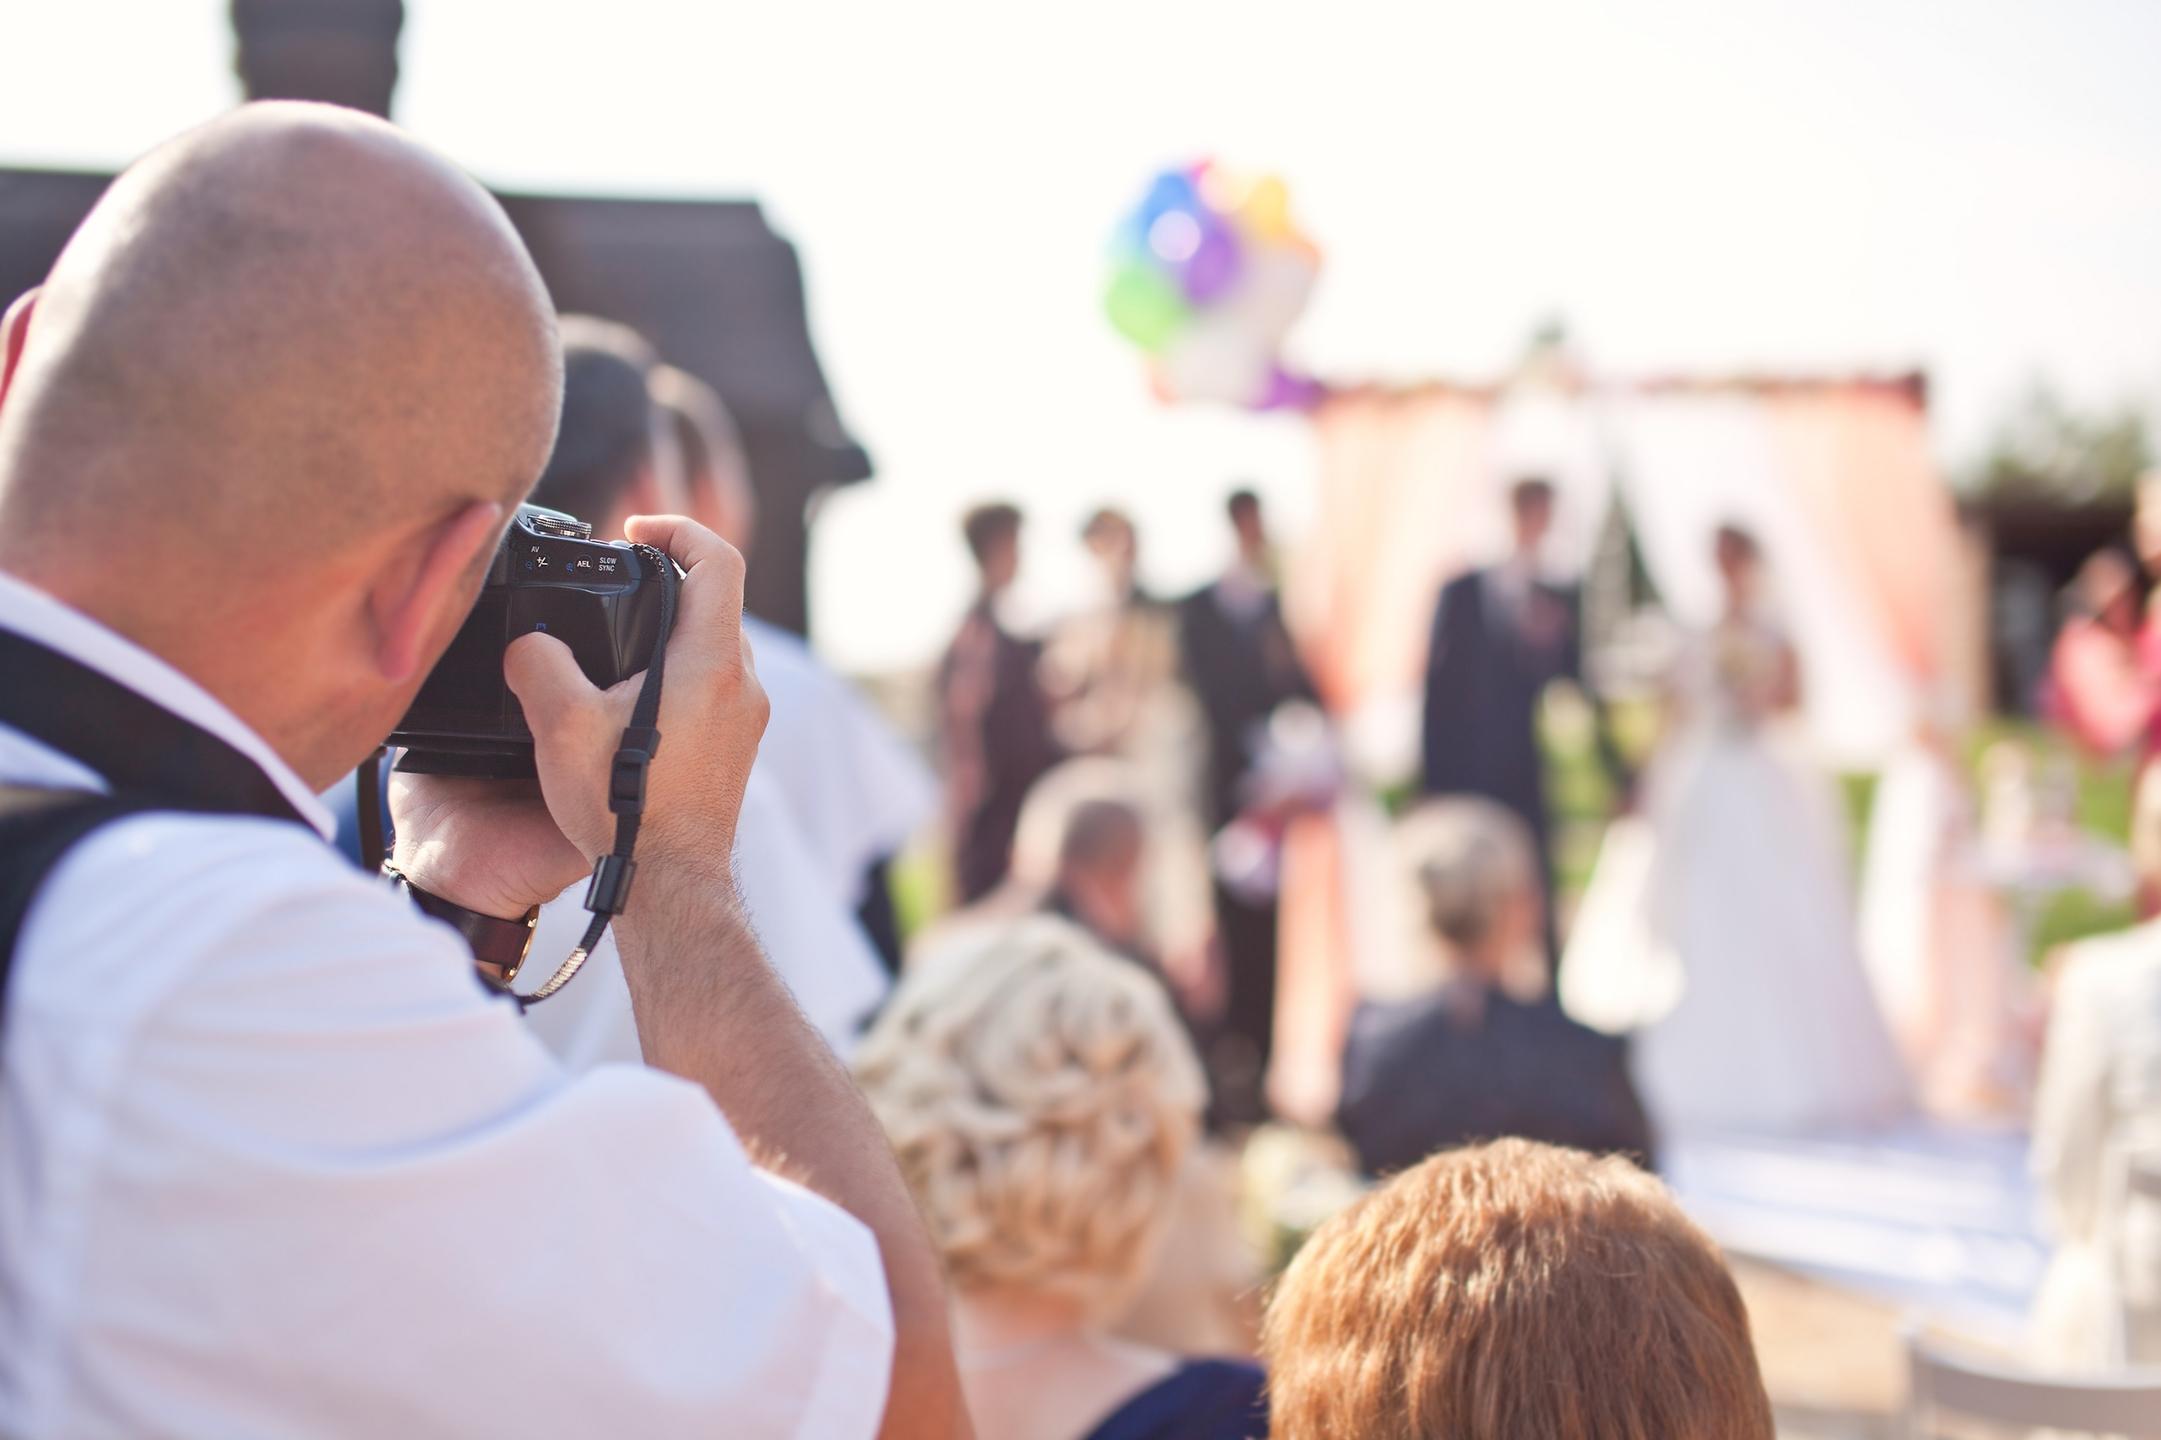 Hochzeitsfotograf (@hochzeits_fotograf) Cover Image